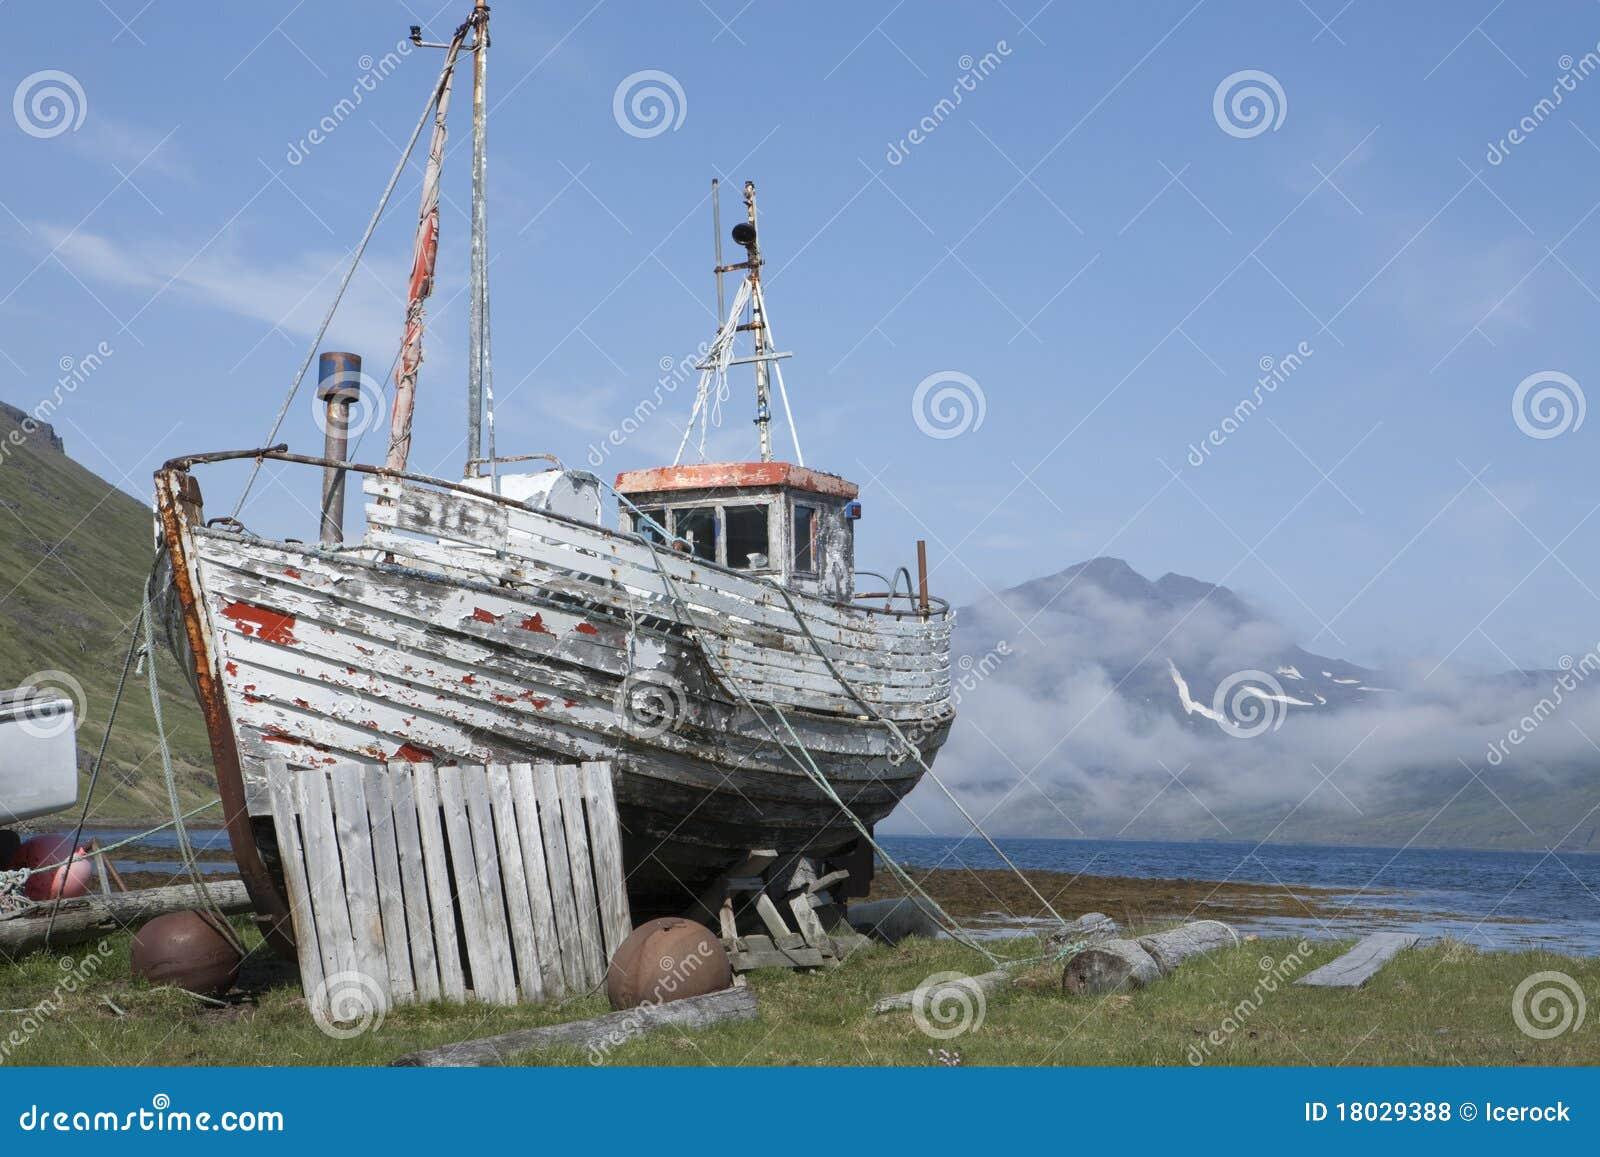 Old Fishing Boat In Strandir, Iceland Royalty Free Stock Photos ...